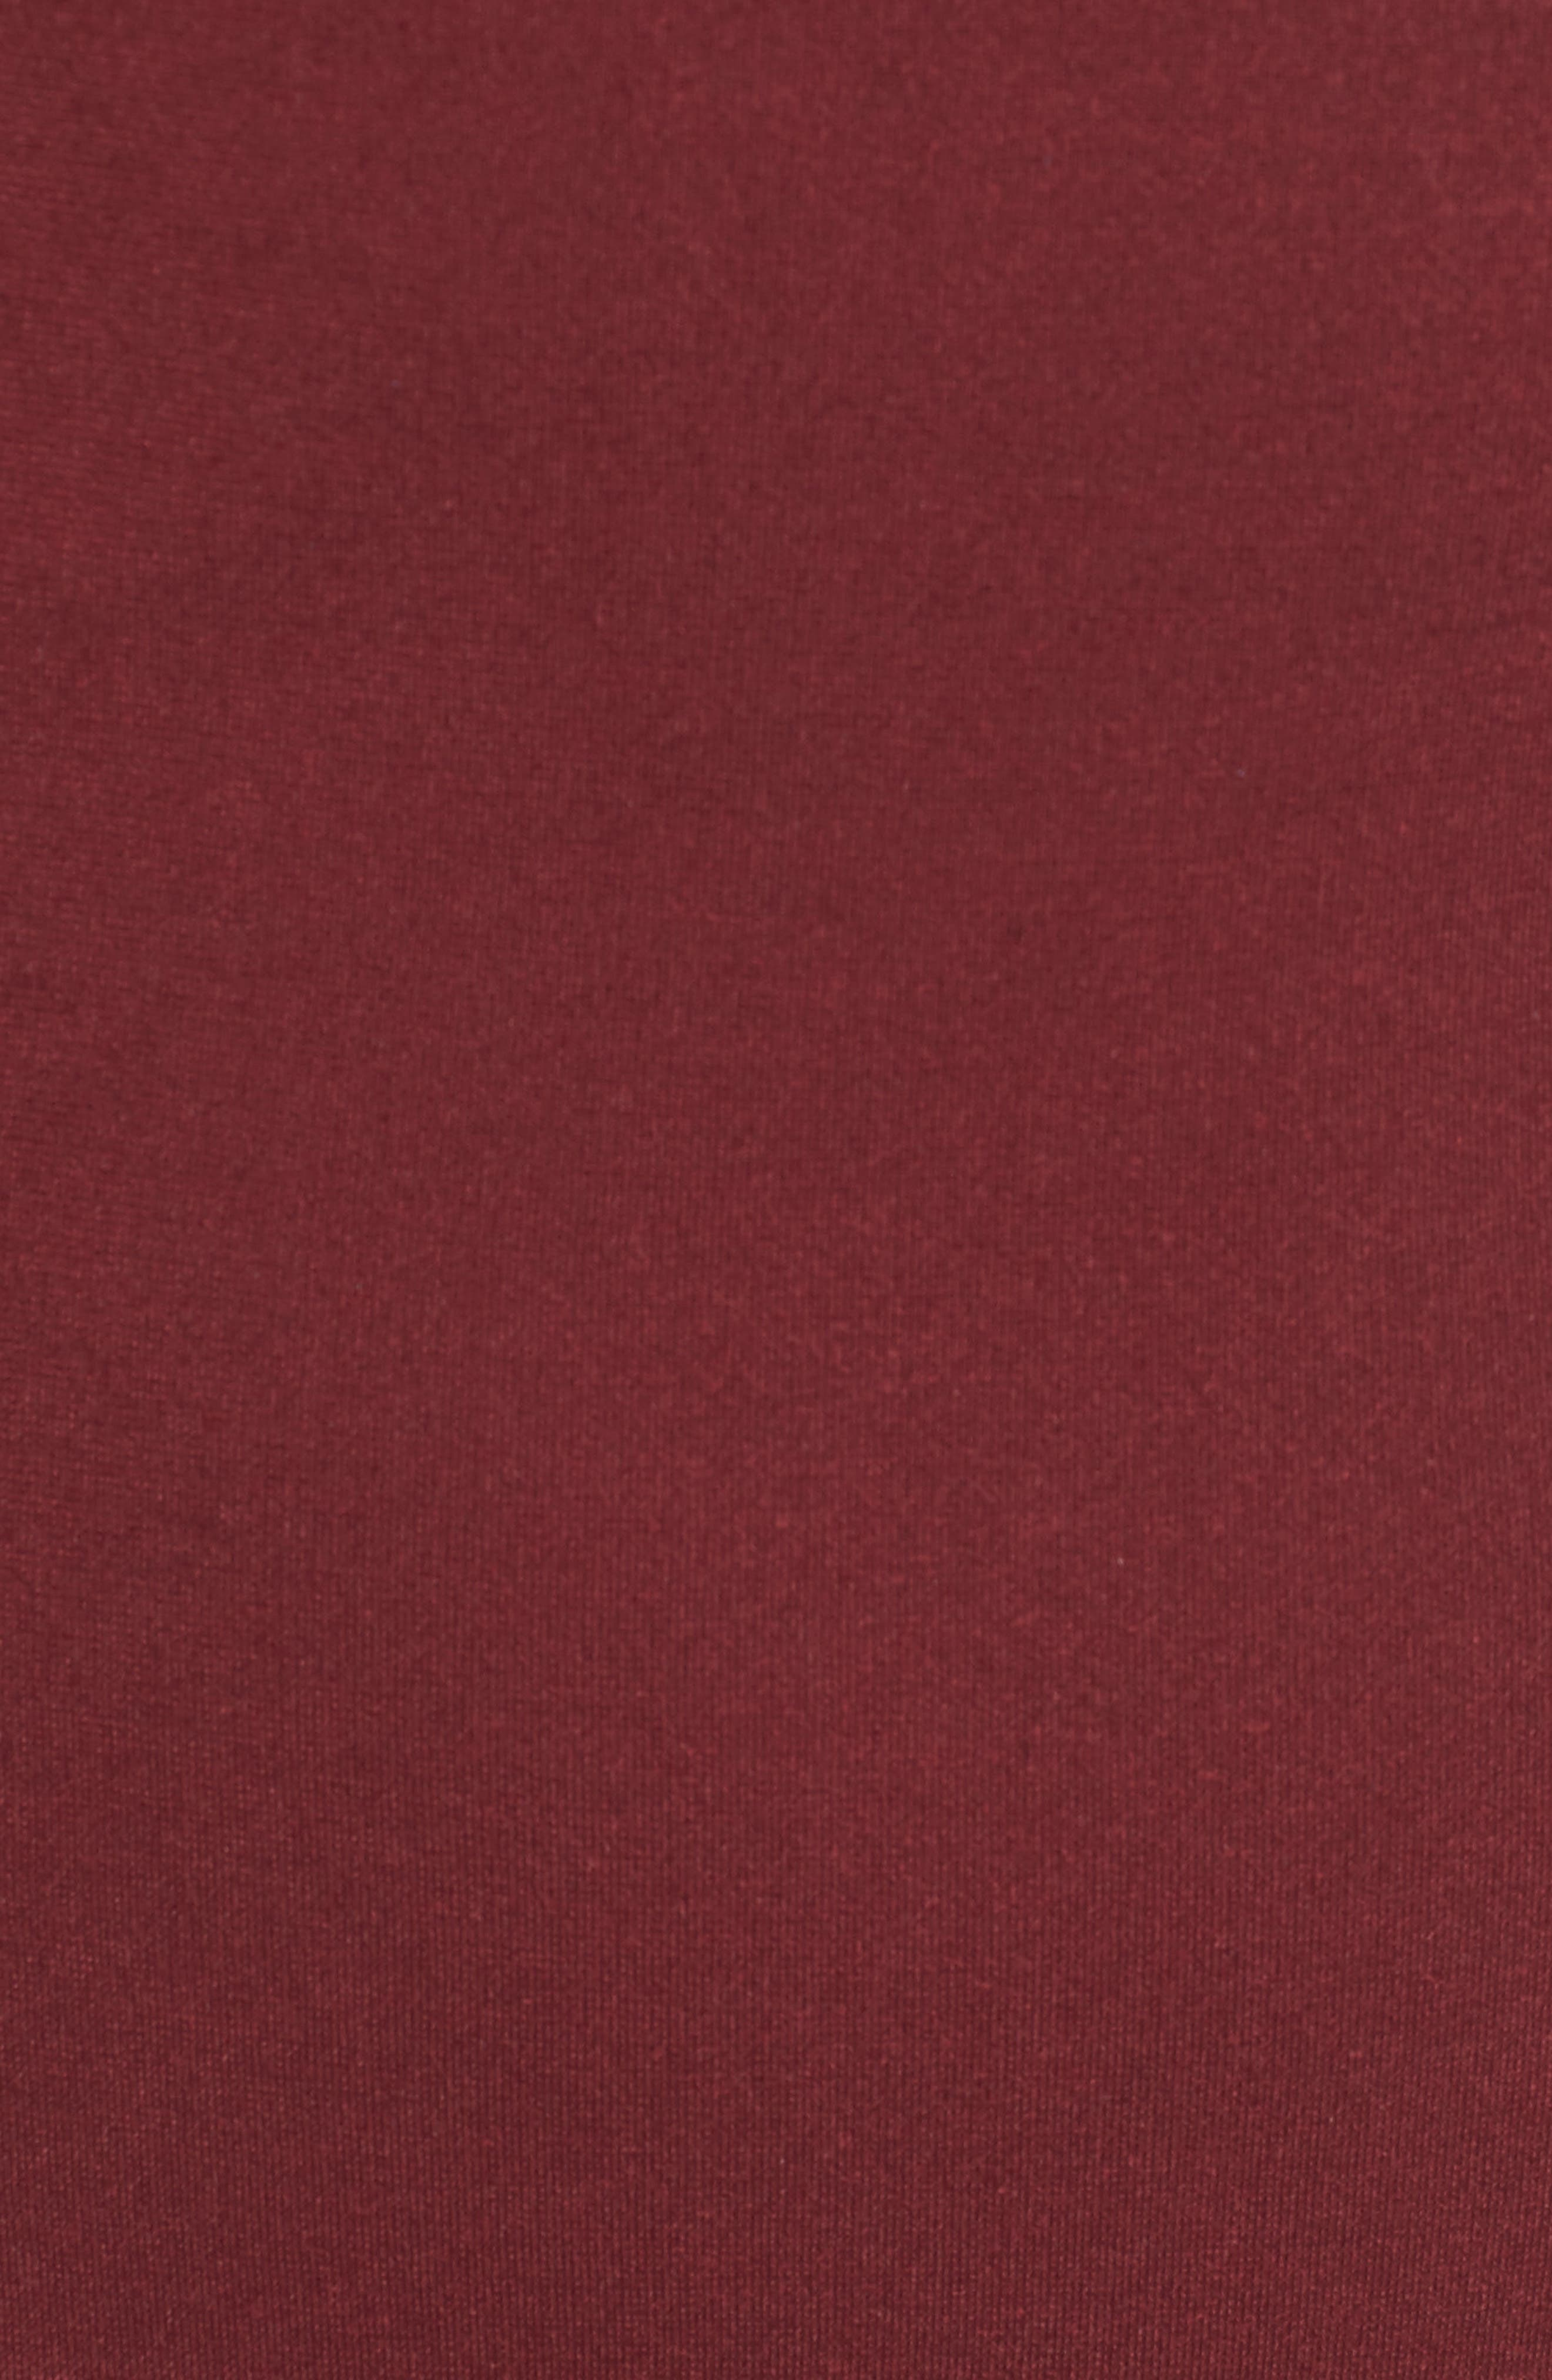 Bishop + Young Ponte Knit Sheath Dress,                             Alternate thumbnail 5, color,                             Burgundy